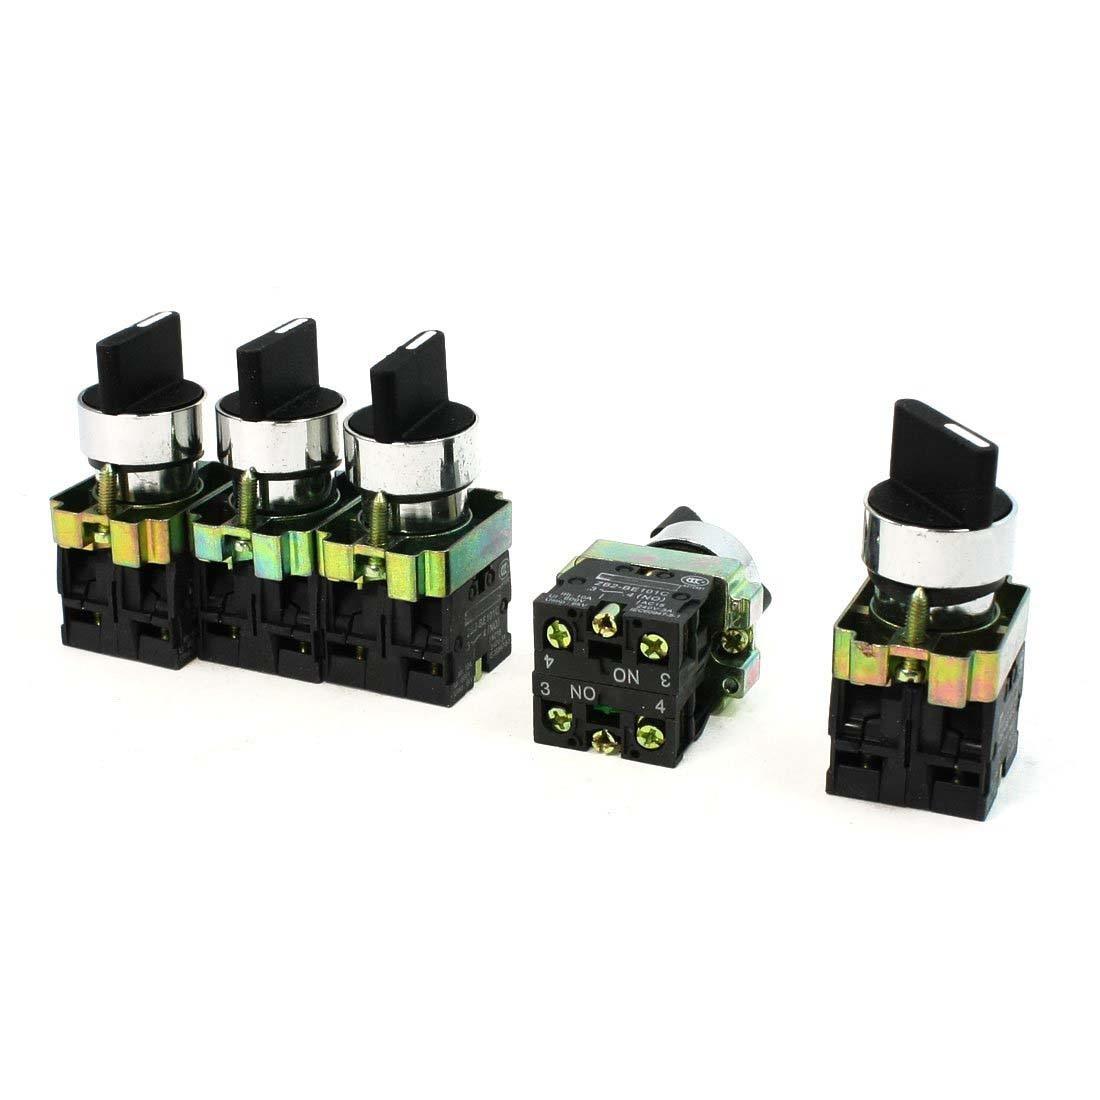 10A Ith 600V Ui Lug Control 4 Terminal 3 Position DPST 2NO Rotary Switch 5Pcs